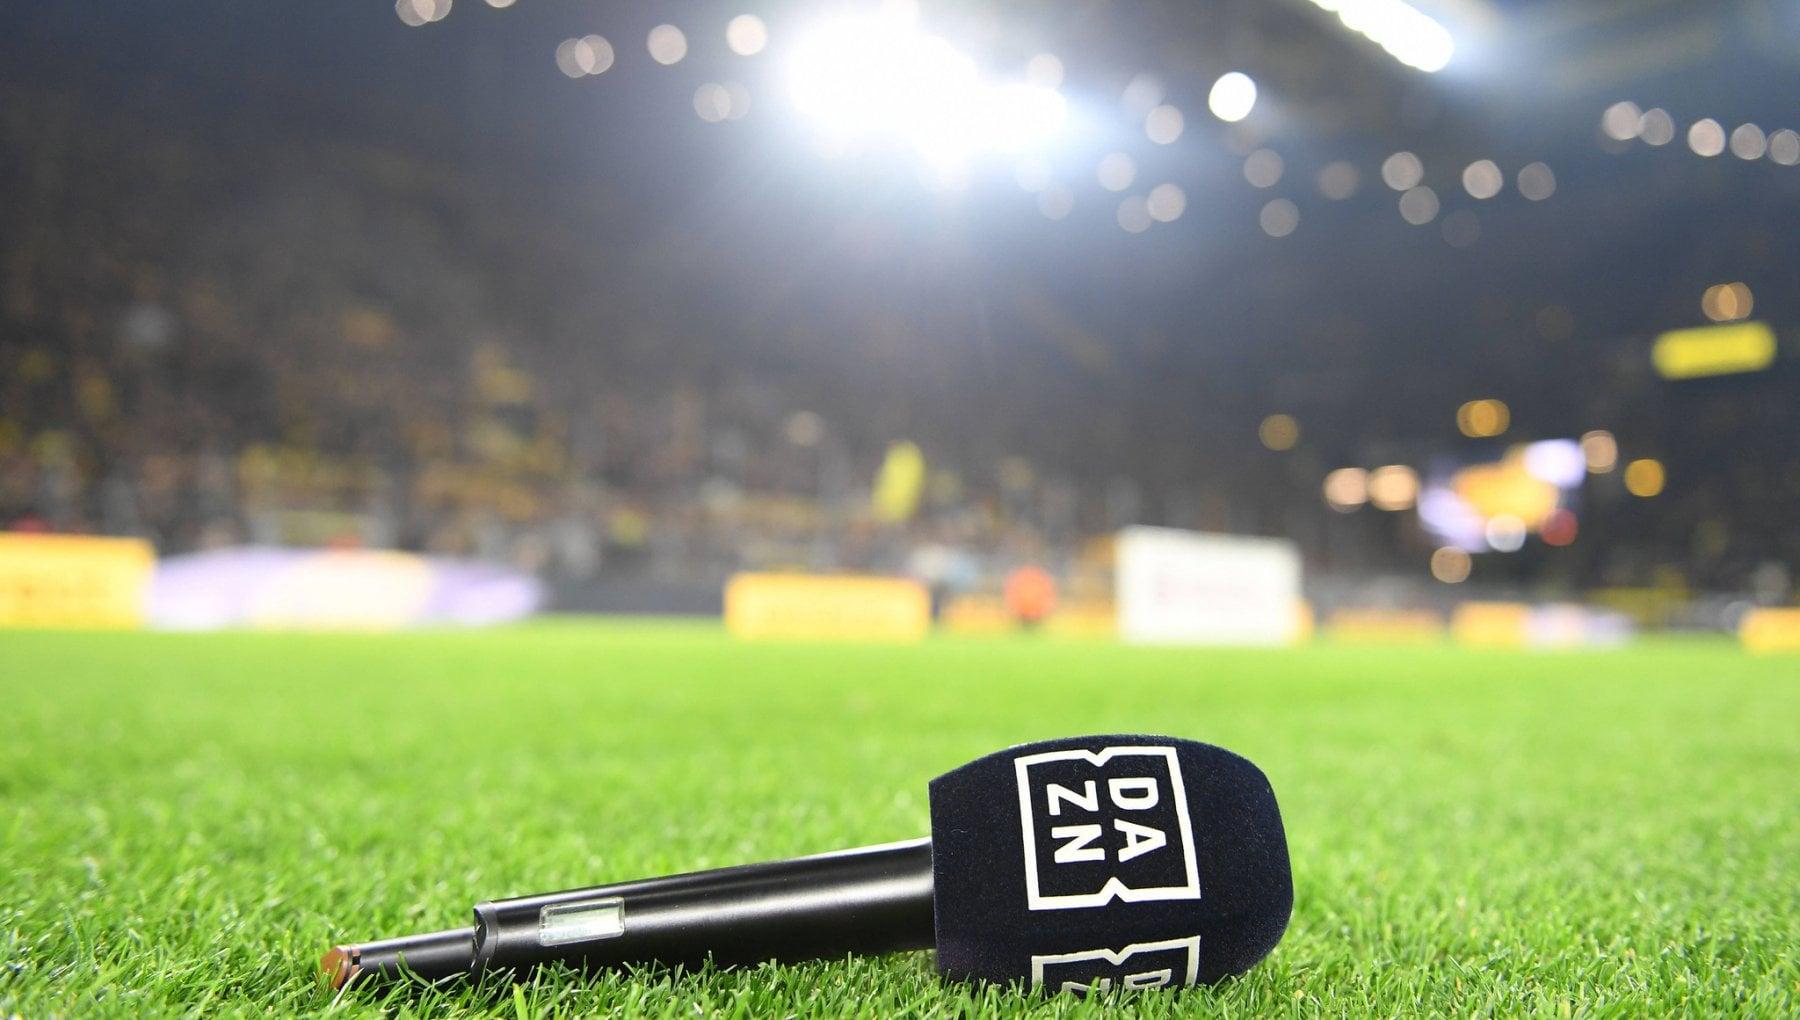 Diritti tv, intesa vicina: sì a Dazn e Tim con 3 partite a Sky